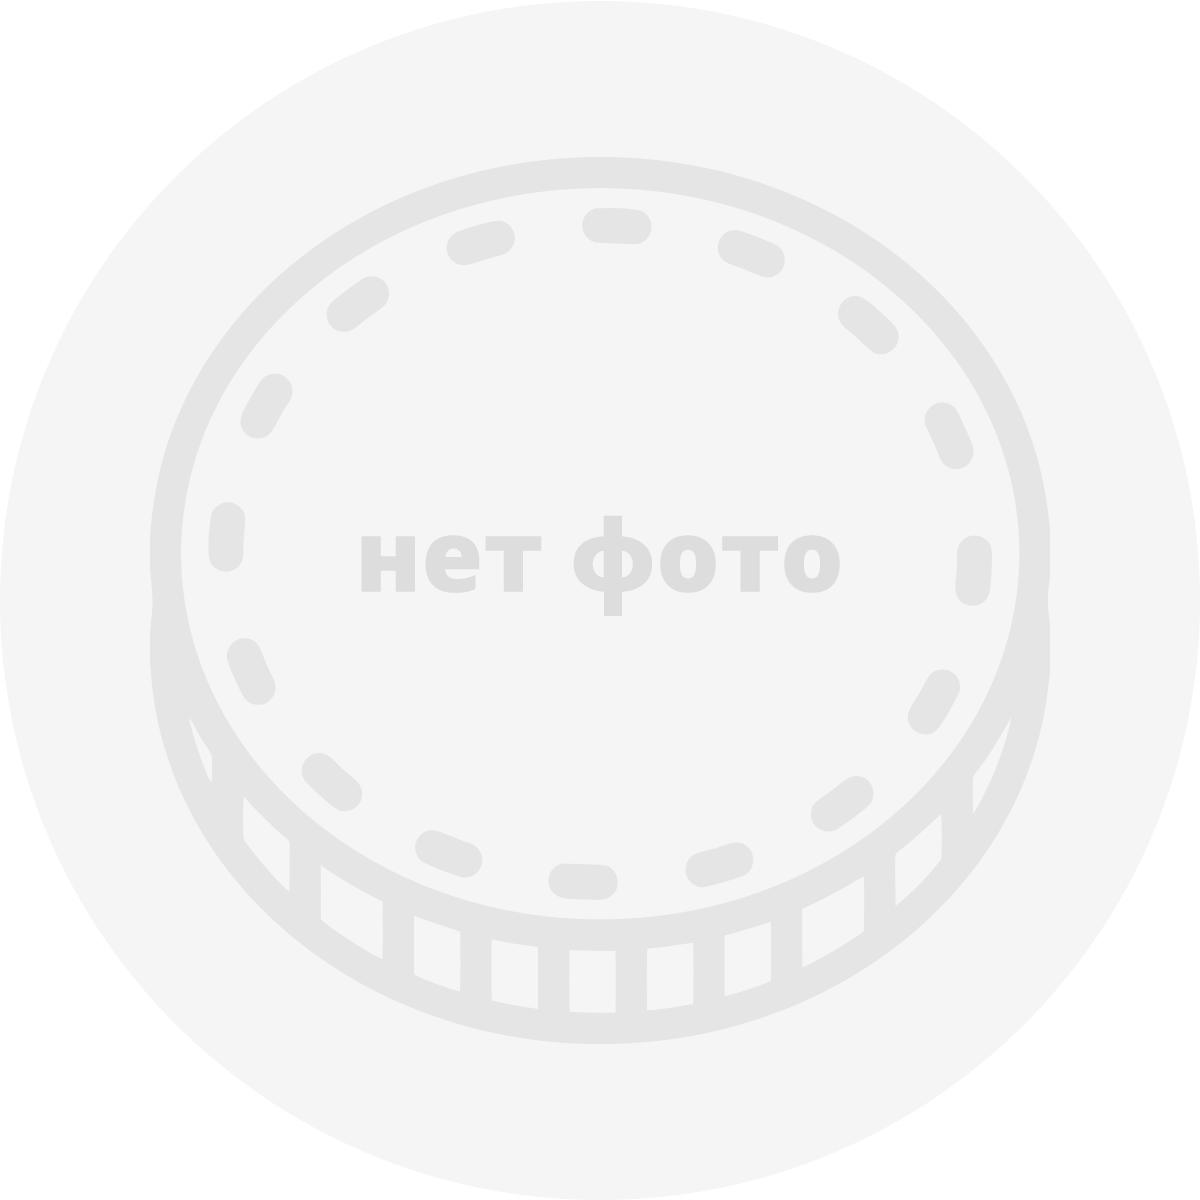 Ичкерия, Набор монет (2013 г.)